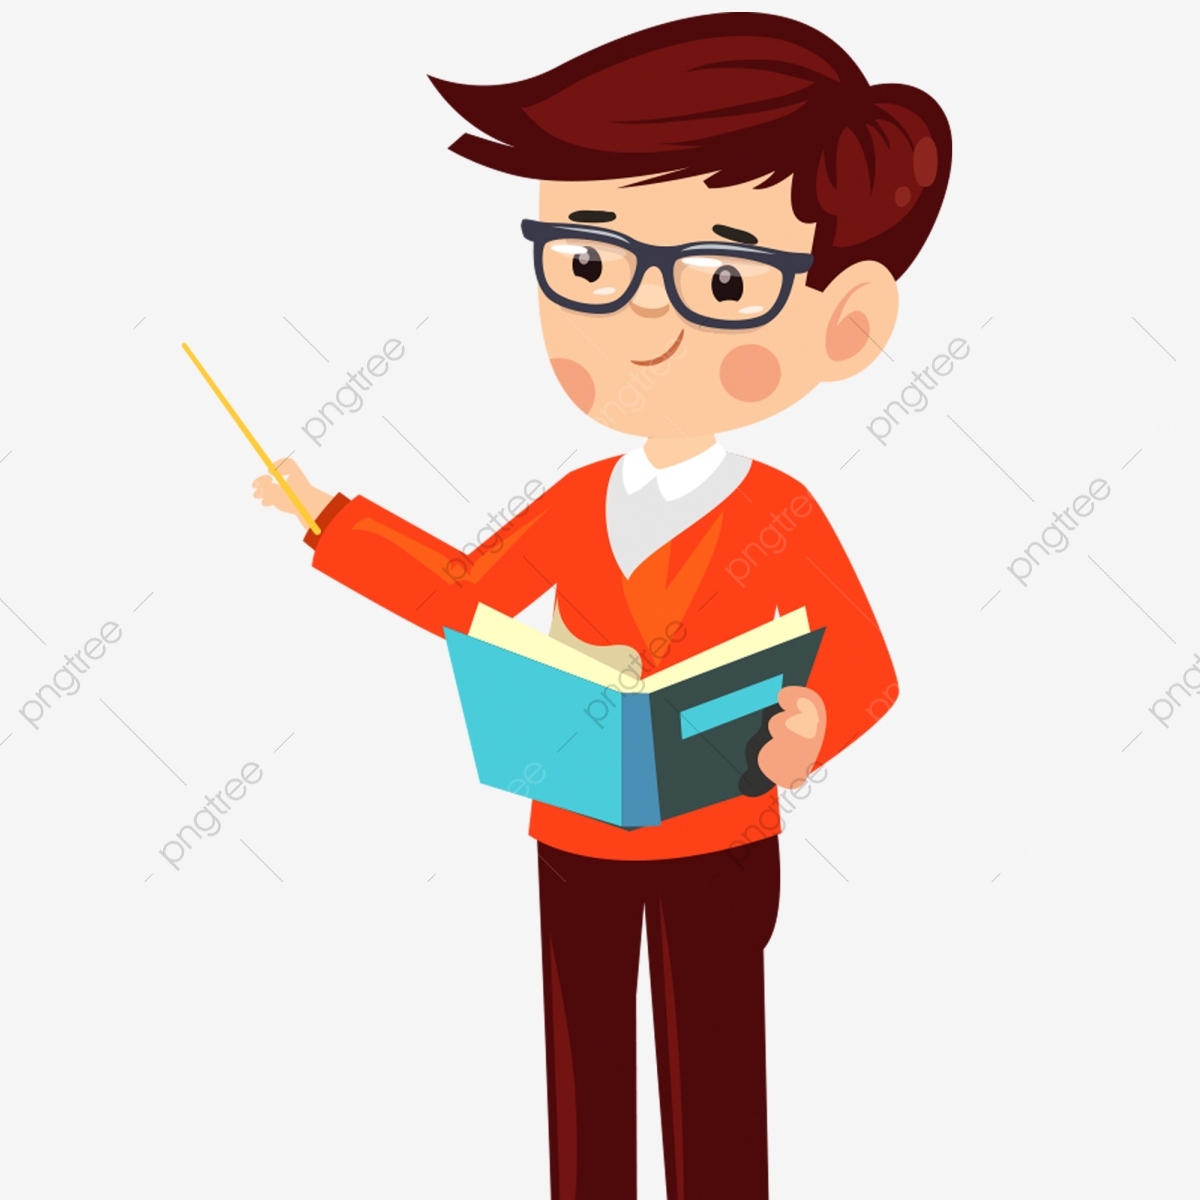 Hand Drawn Short Hair Teacher Decorative Elements Teacher Clipart Teacher Men Png Transparent Clipart Image And Psd File For Free Download